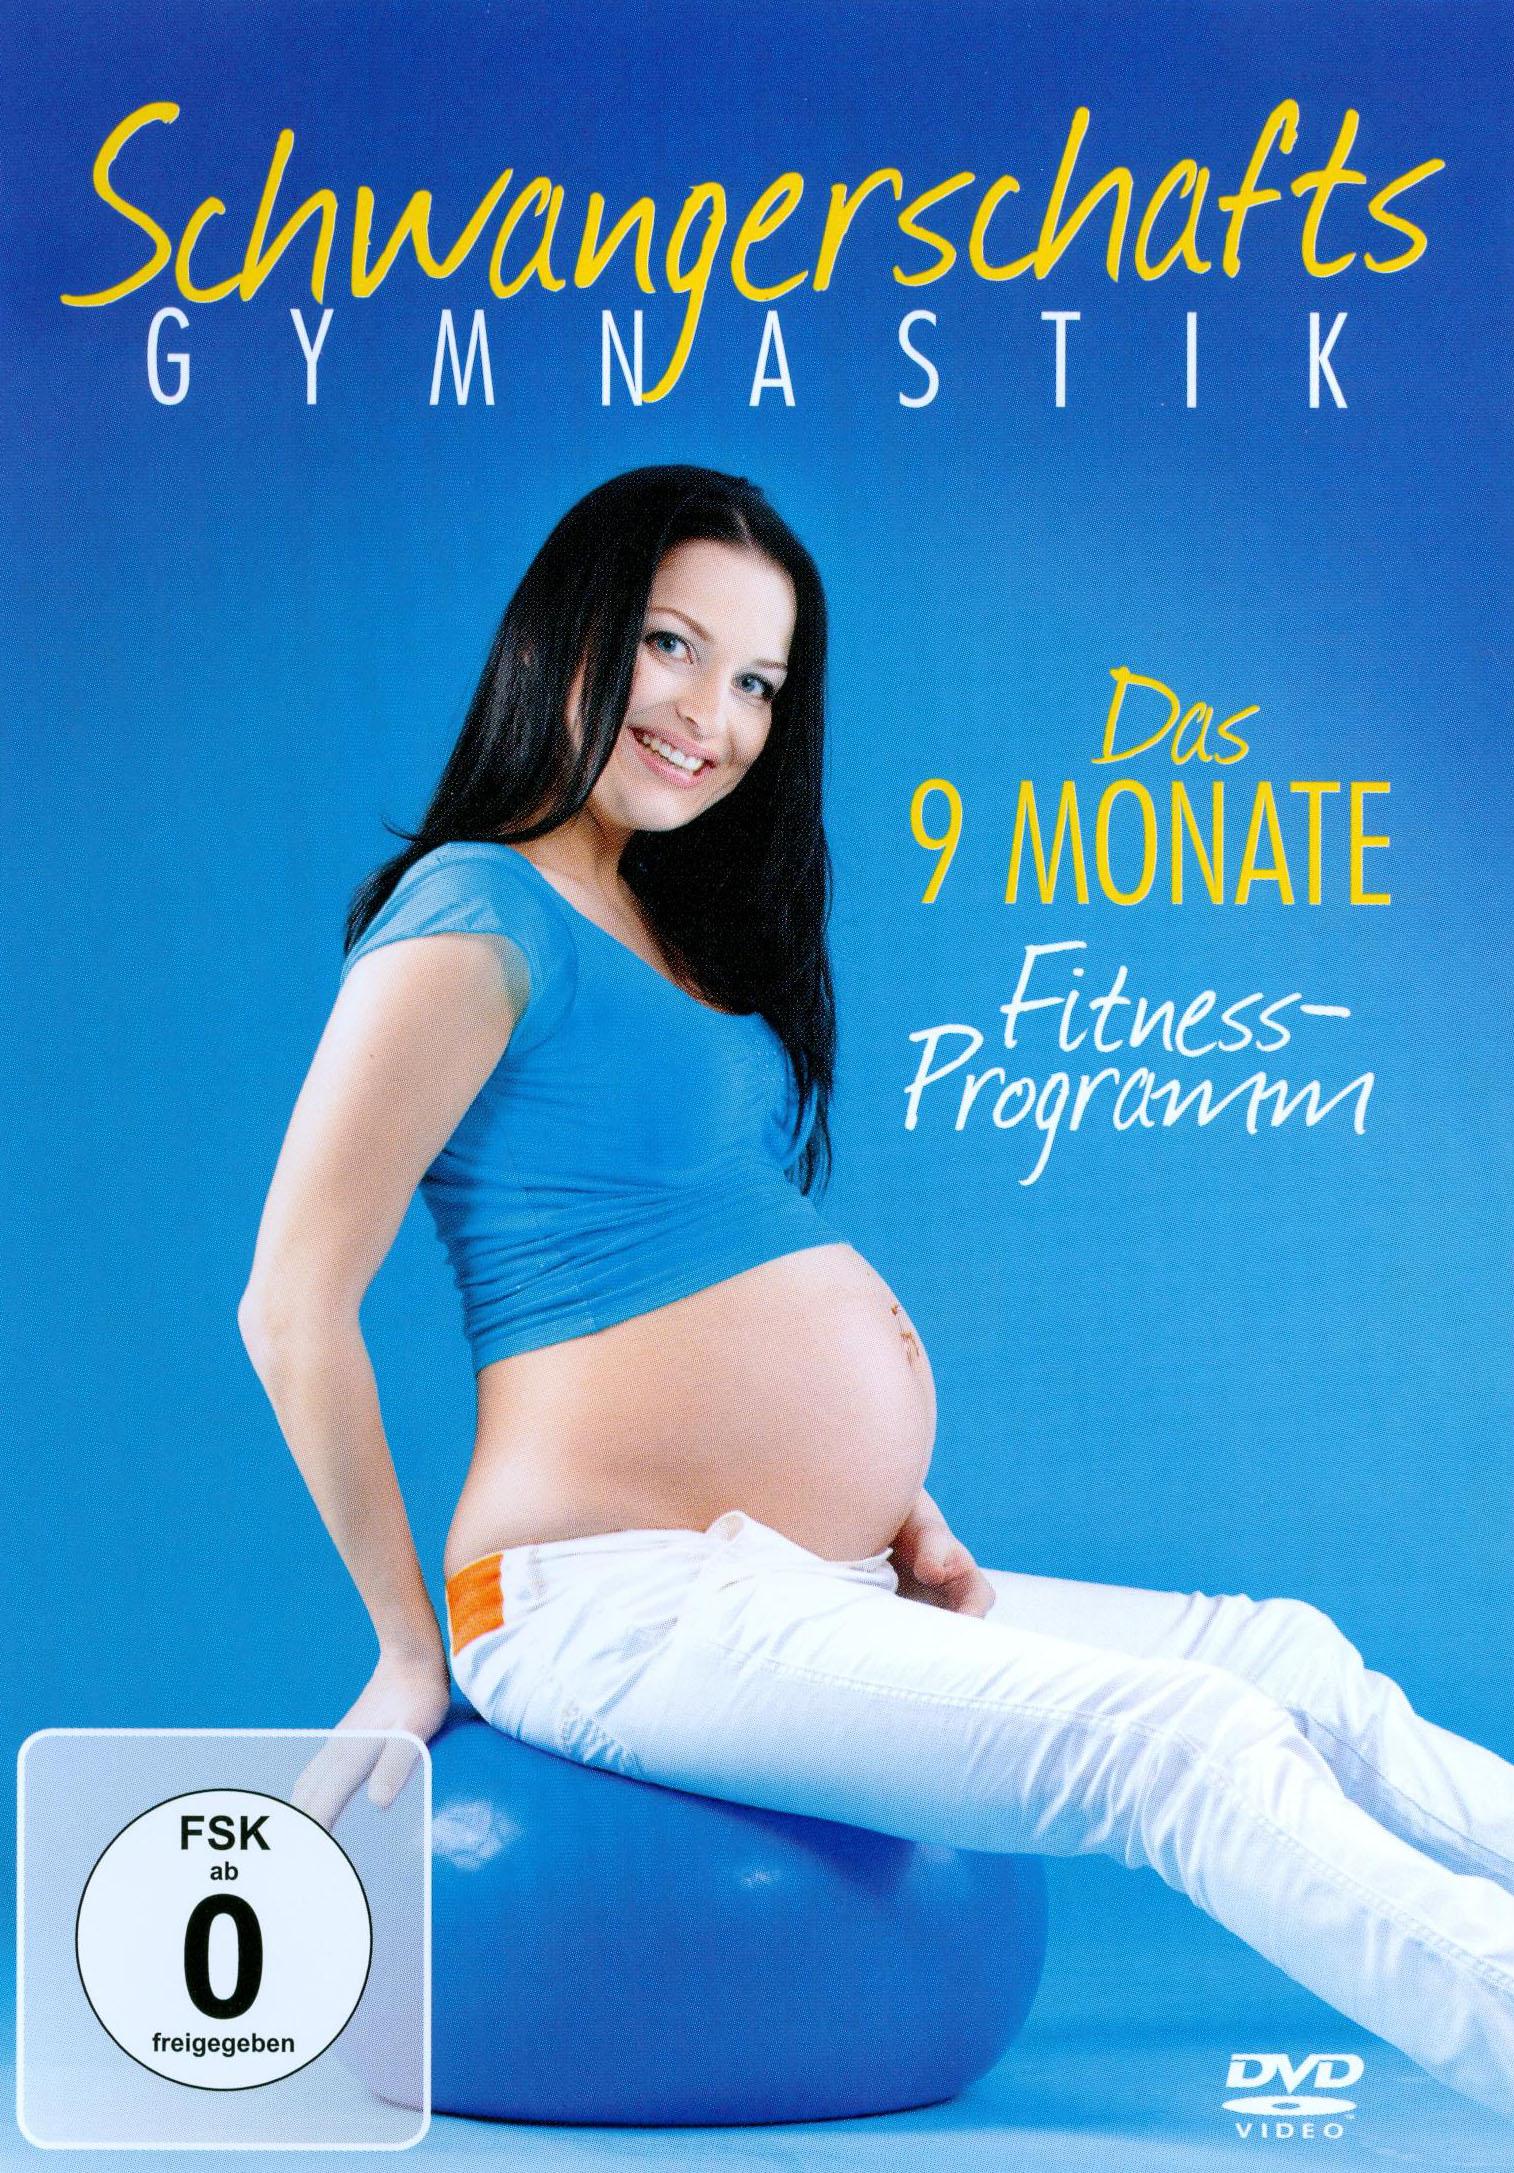 Schwangerschafts Gymnastik